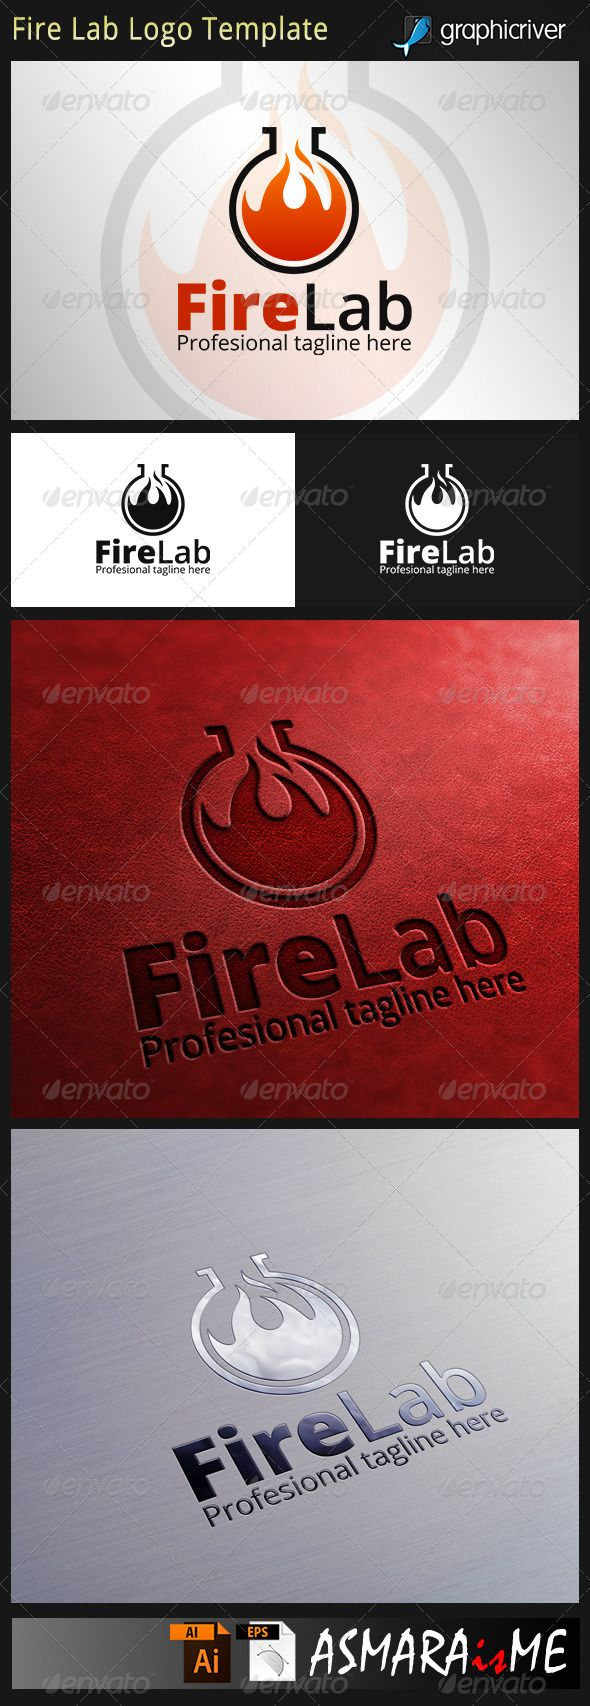 Fire Lab Logo